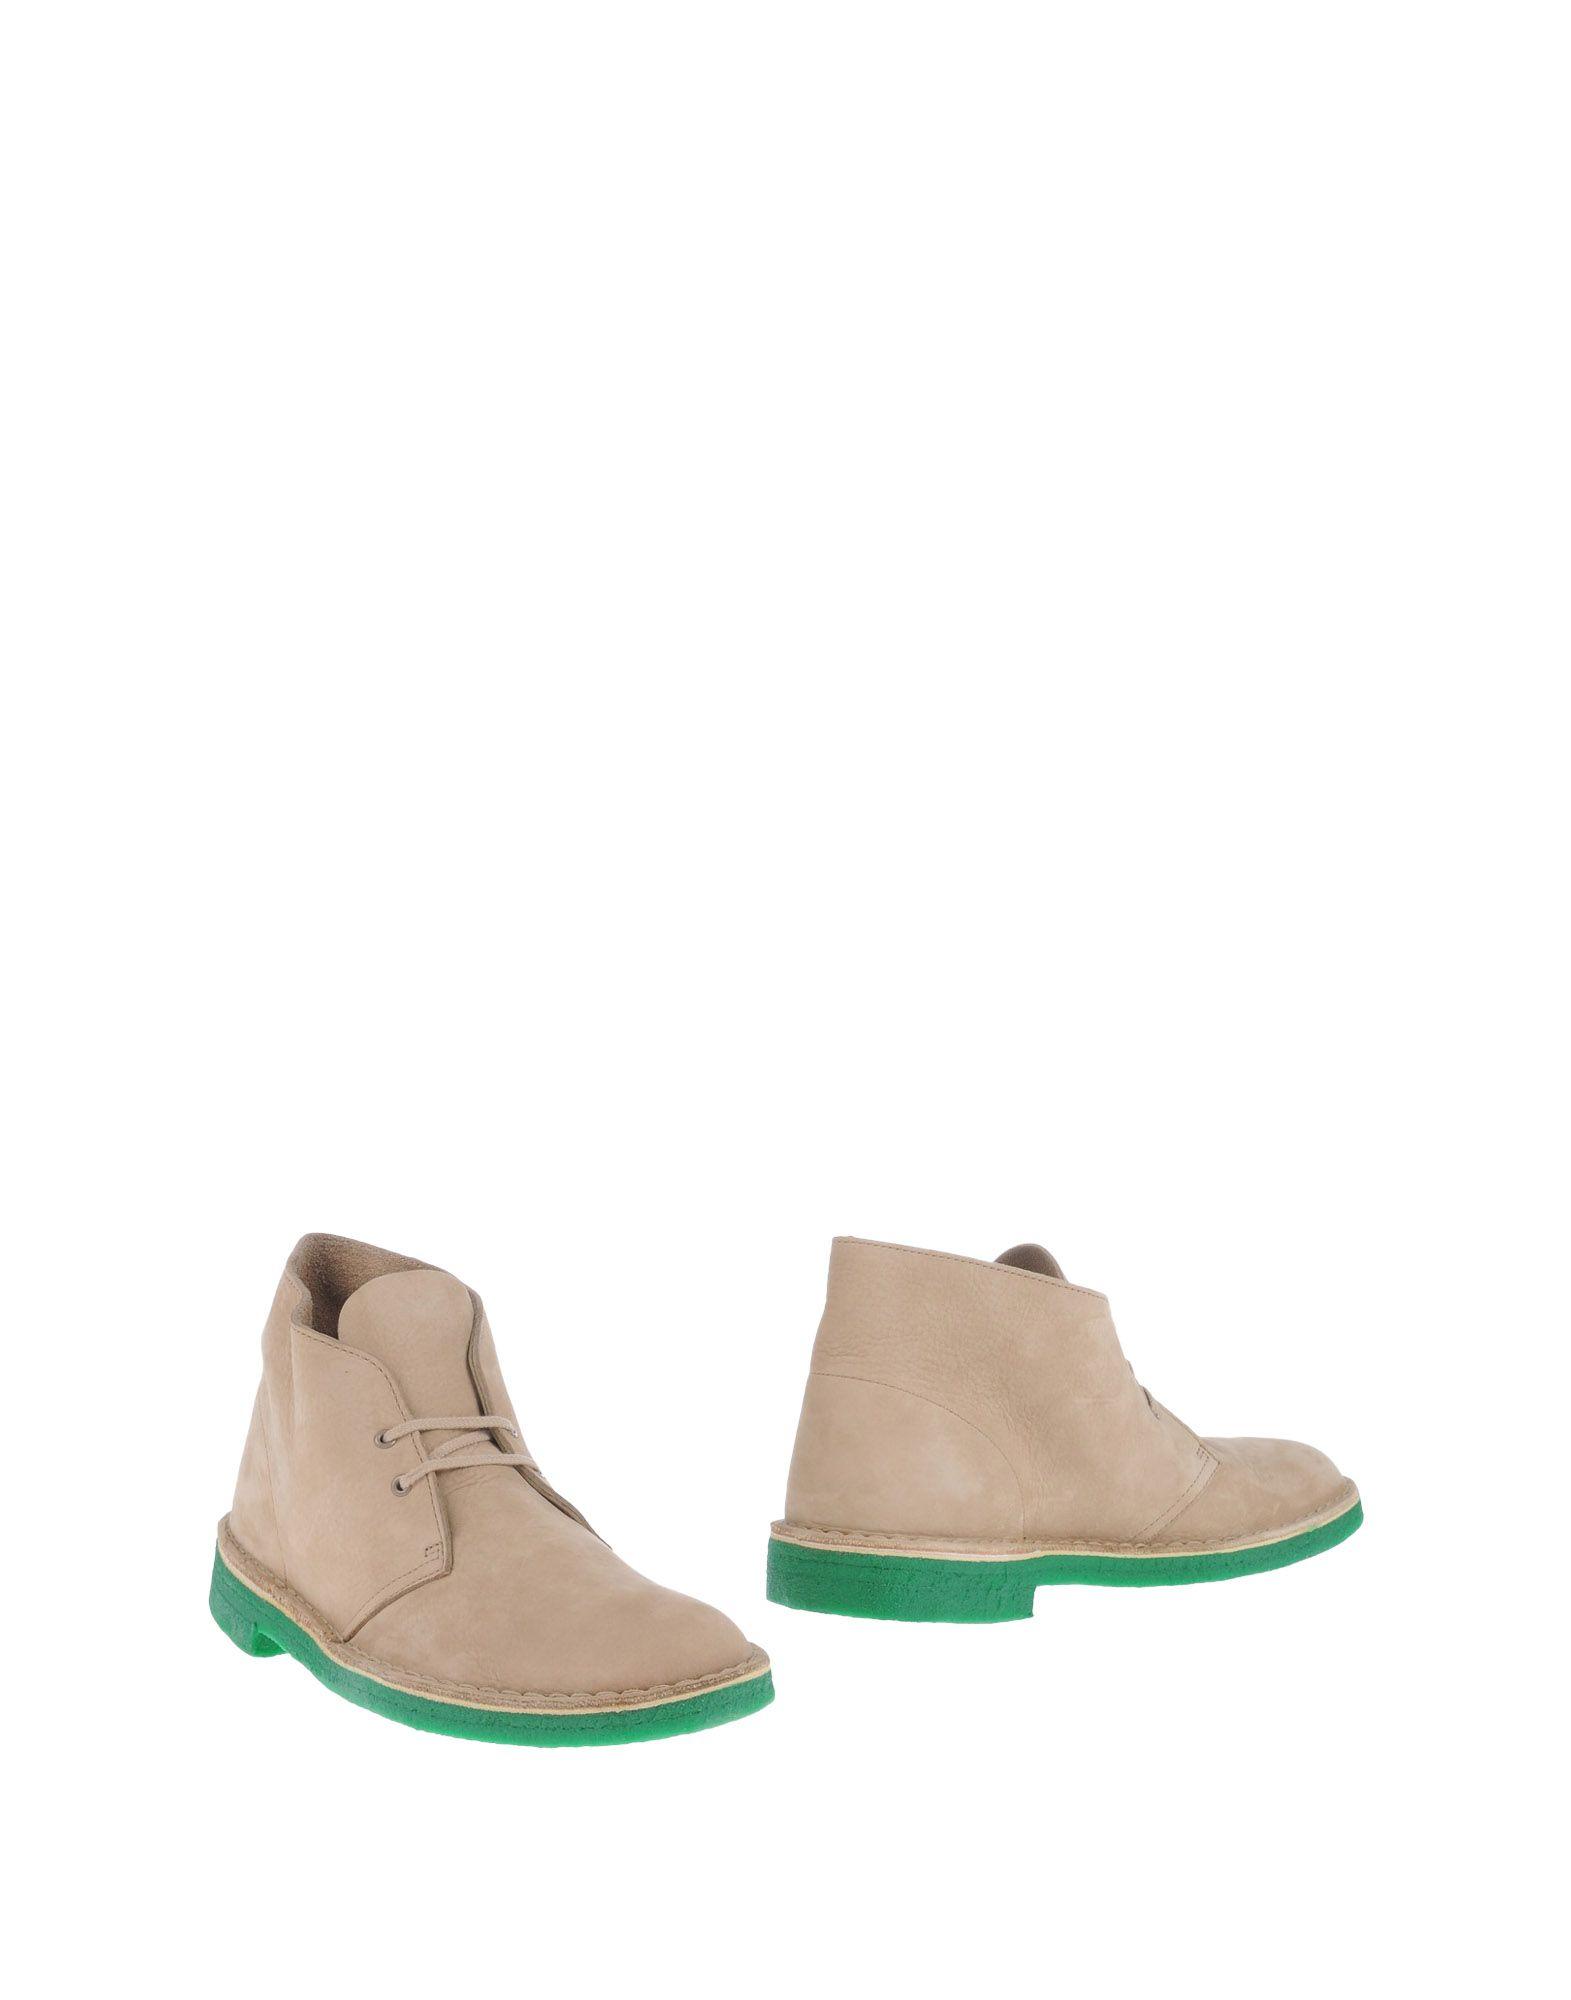 Rabatt echte Stiefelette Schuhe Clarks Originals Stiefelette echte Herren  11173723UC 590002